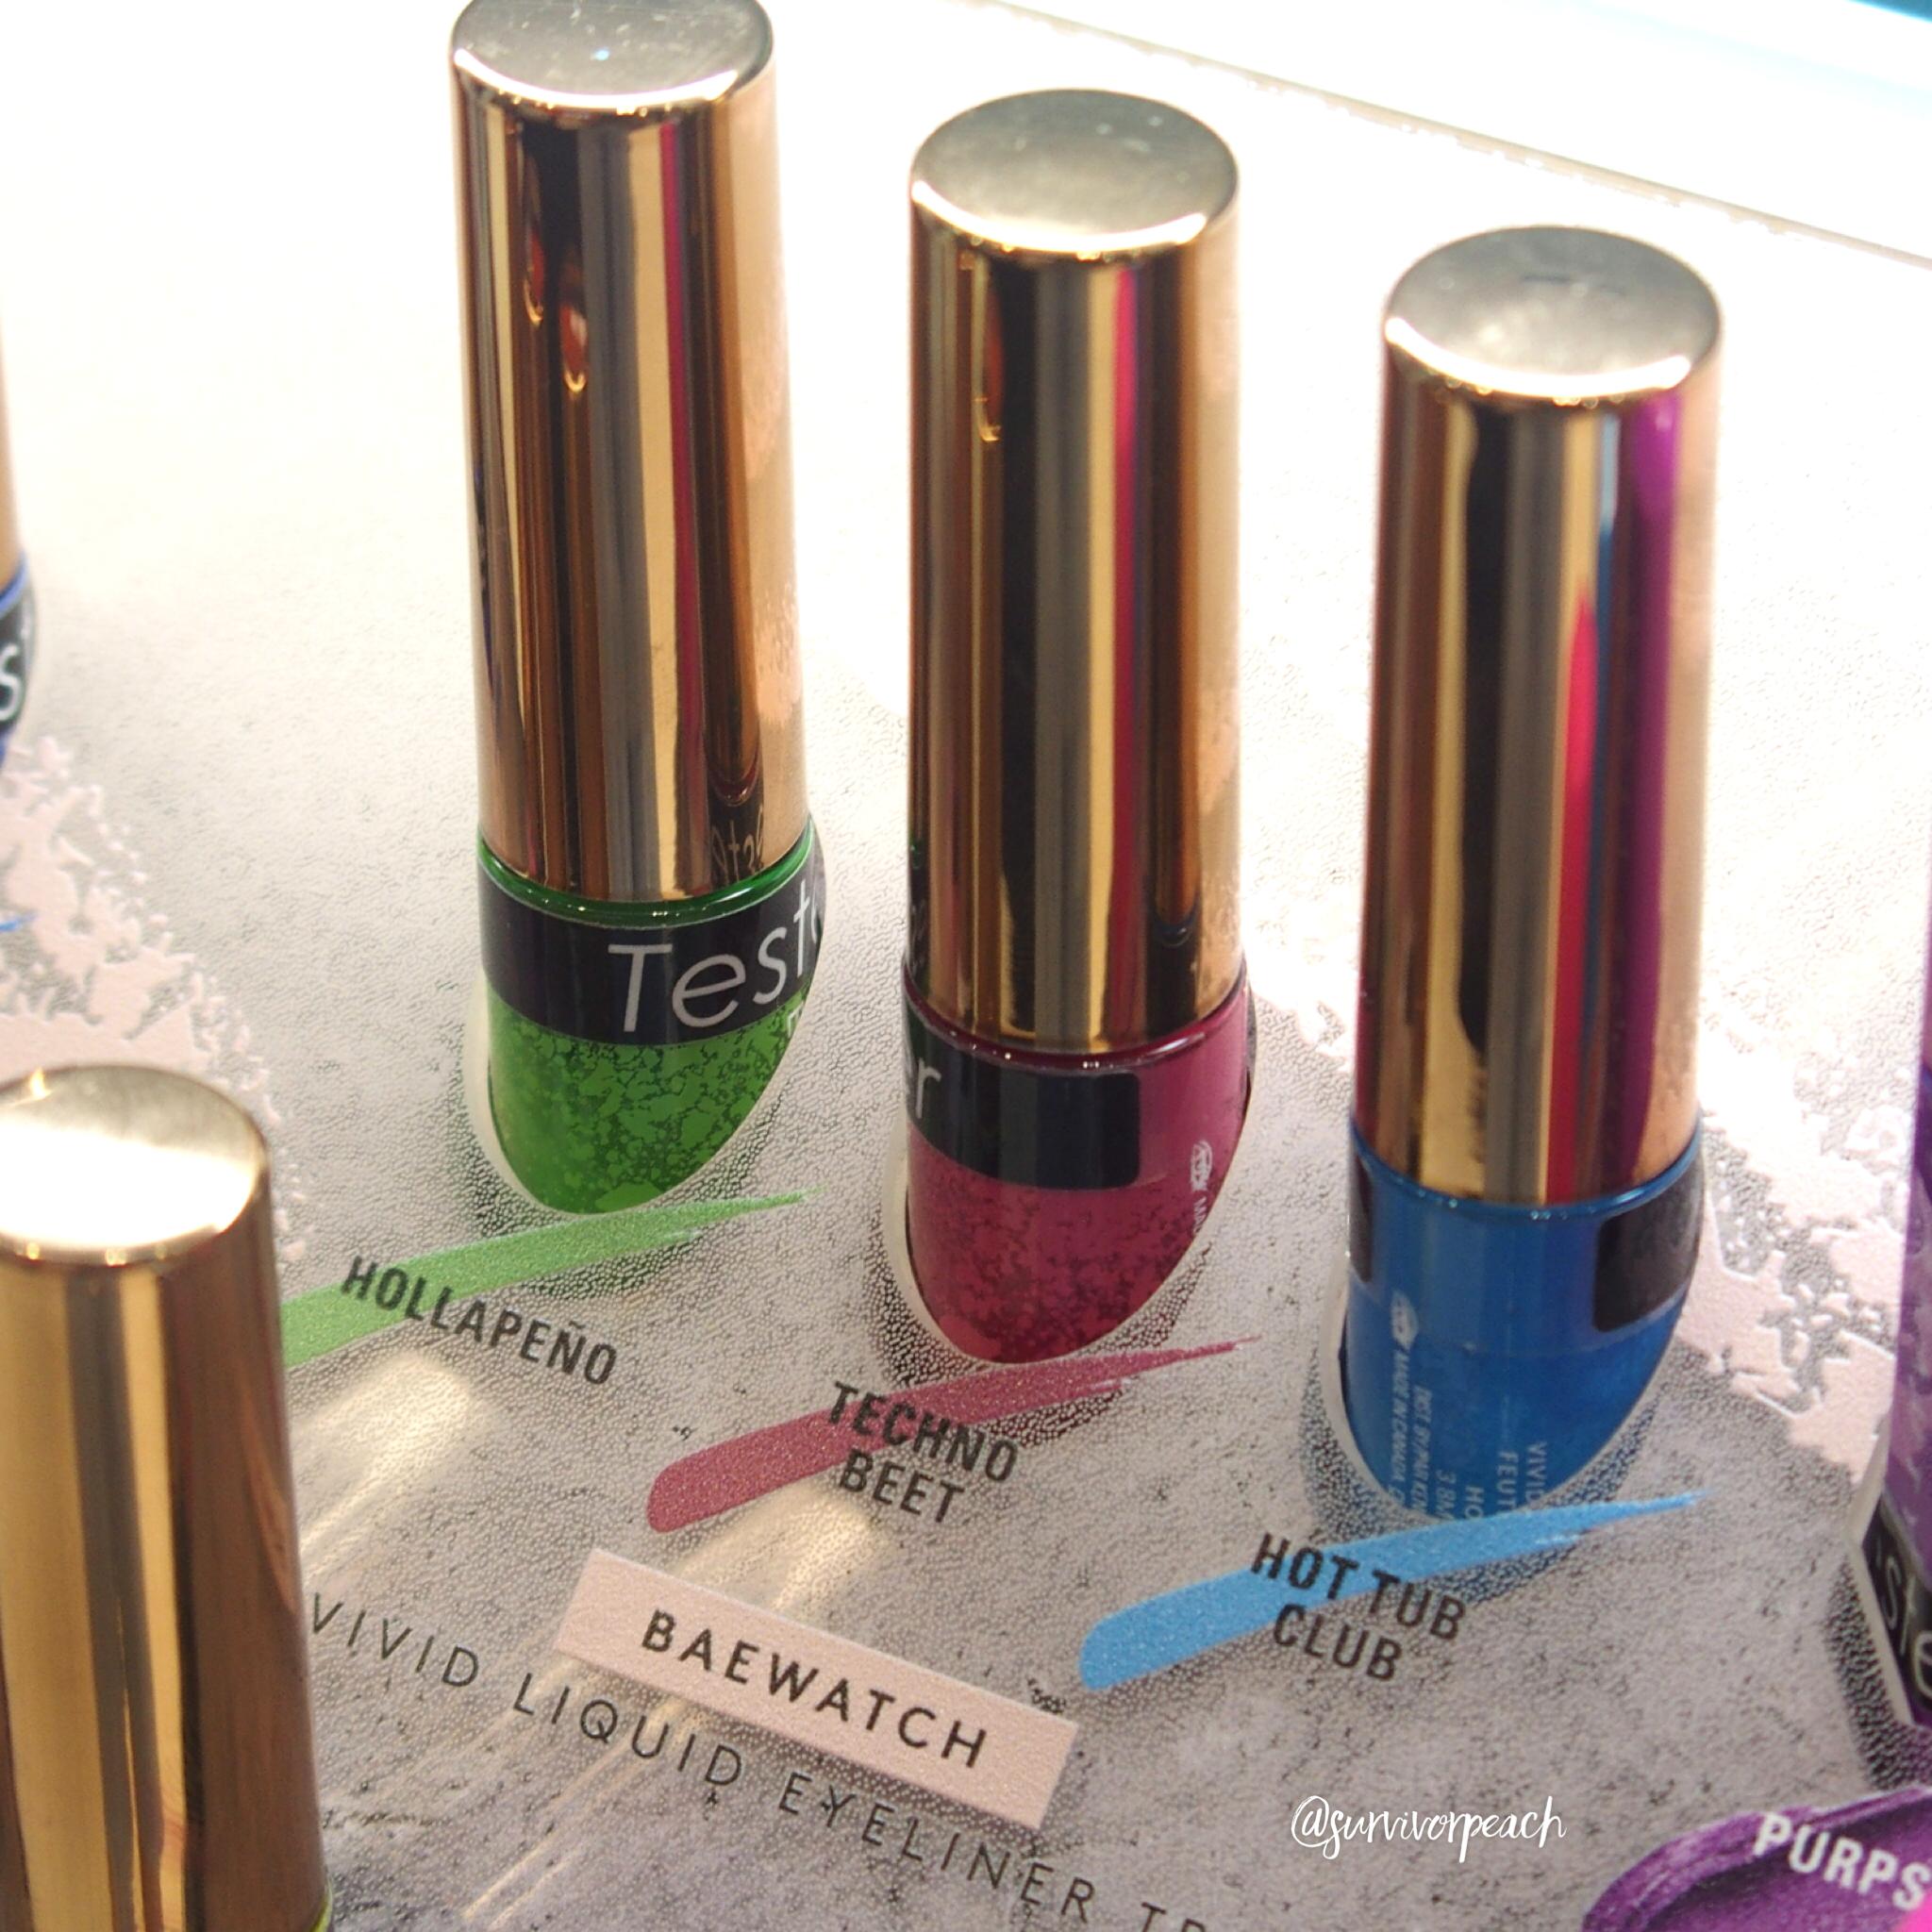 Fenty Beauty Vivid Liquid Eyeliner Trio - Baewatch: Hollapend, Techno Beet, Hot Tub Club